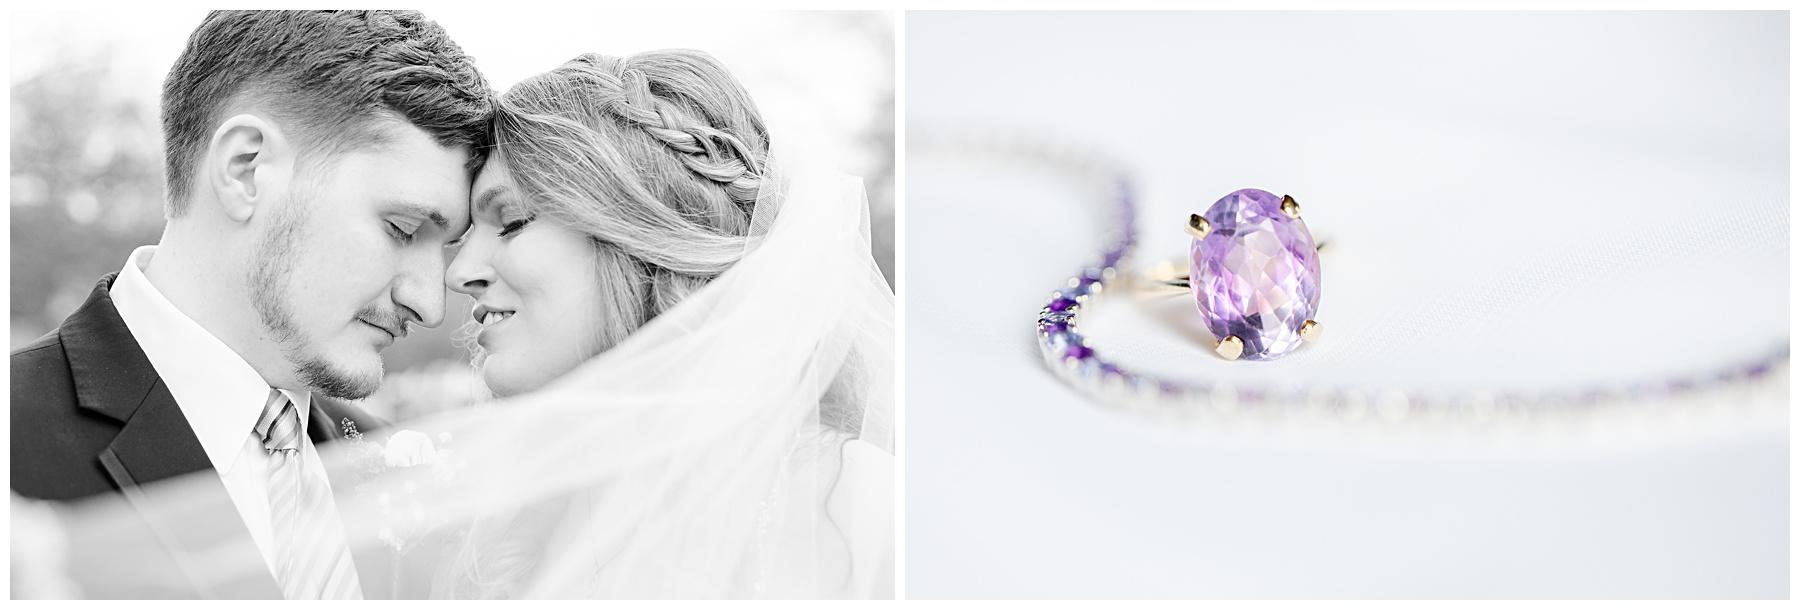 Steele mansion wedding, Cleveland wedding photographer, spring wedding, Lake Erie college, Trisha McCarthy photo